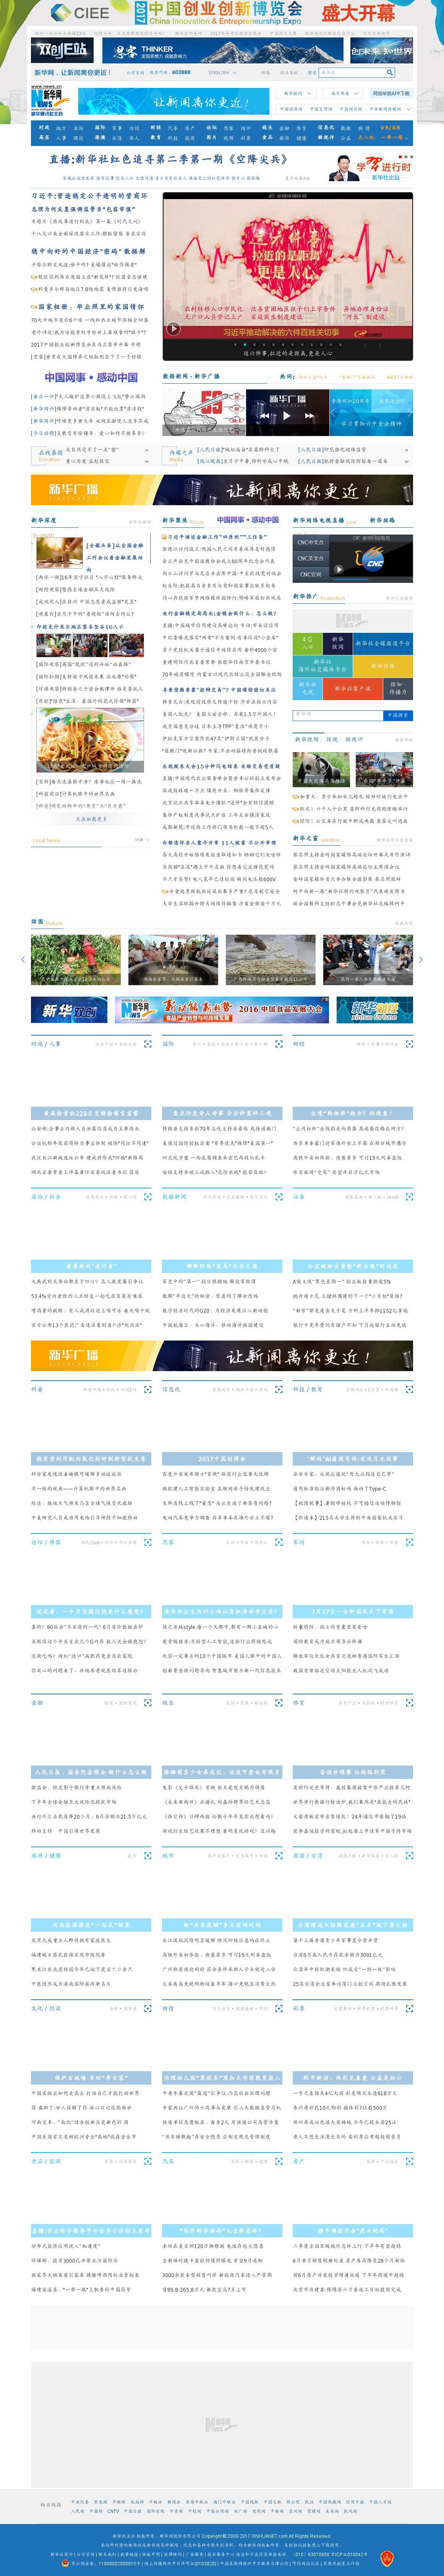 Xinhua at Tuesday July 18, 2017, 3:28 a.m. UTC